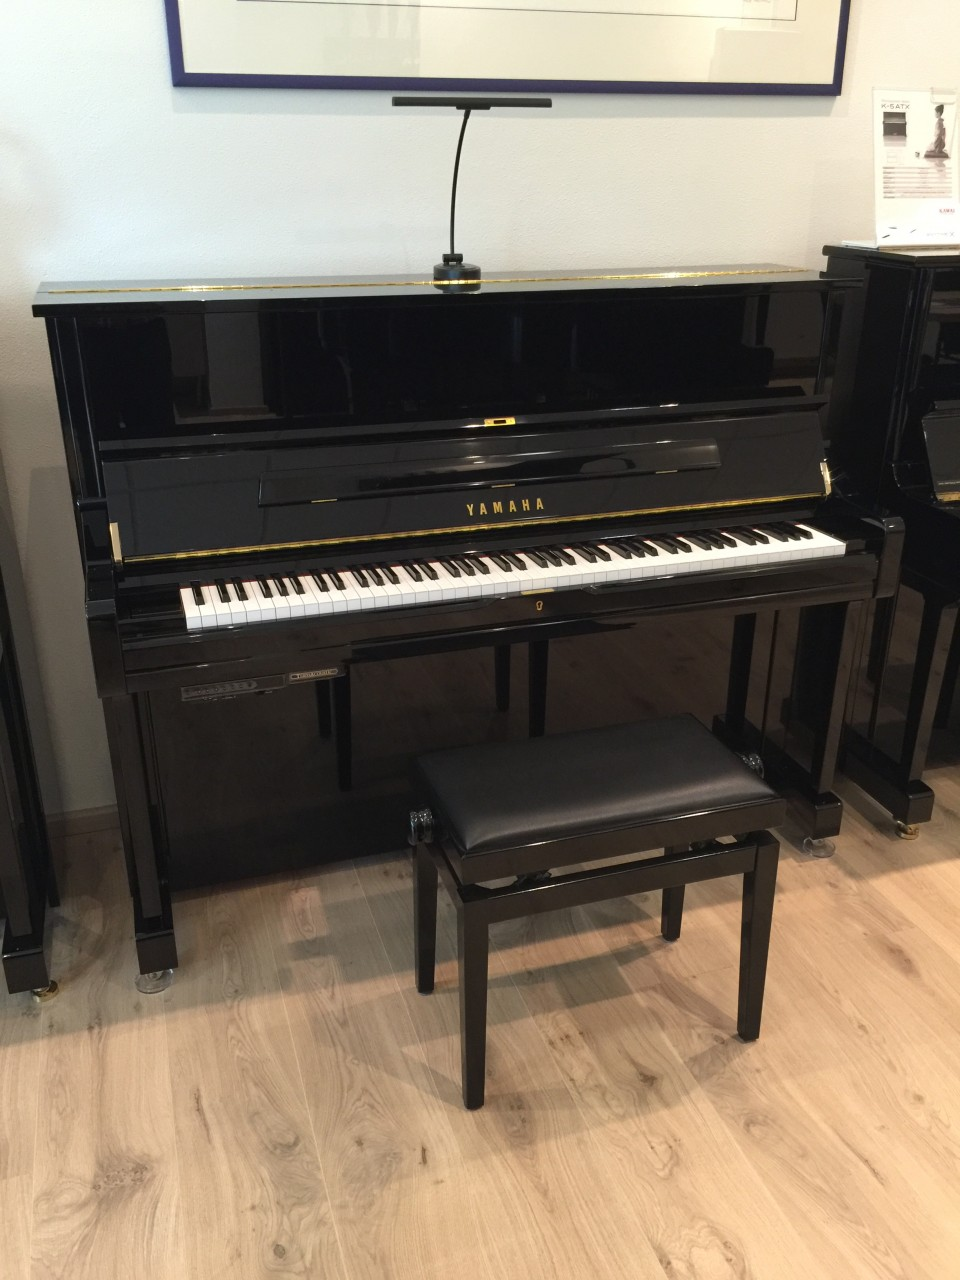 Yamaha U1 TA PE TransAcoustic piano Demo